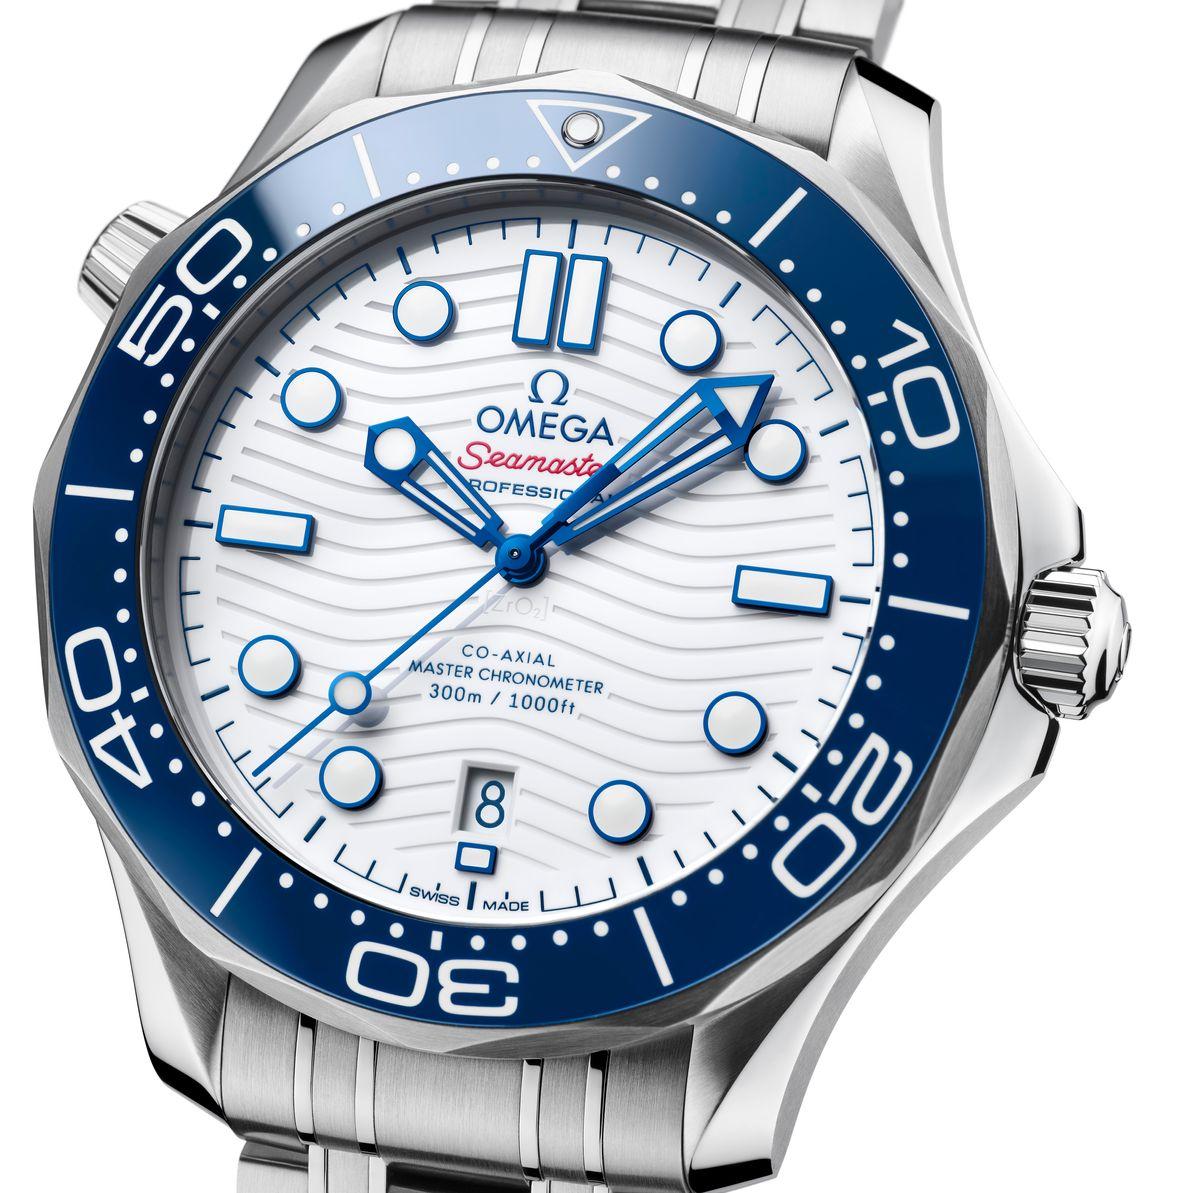 Omega Seamaster Tokyo 2020 Edition Diver 300M Olympics 522.30.42.20.04.001 Blue Bezel